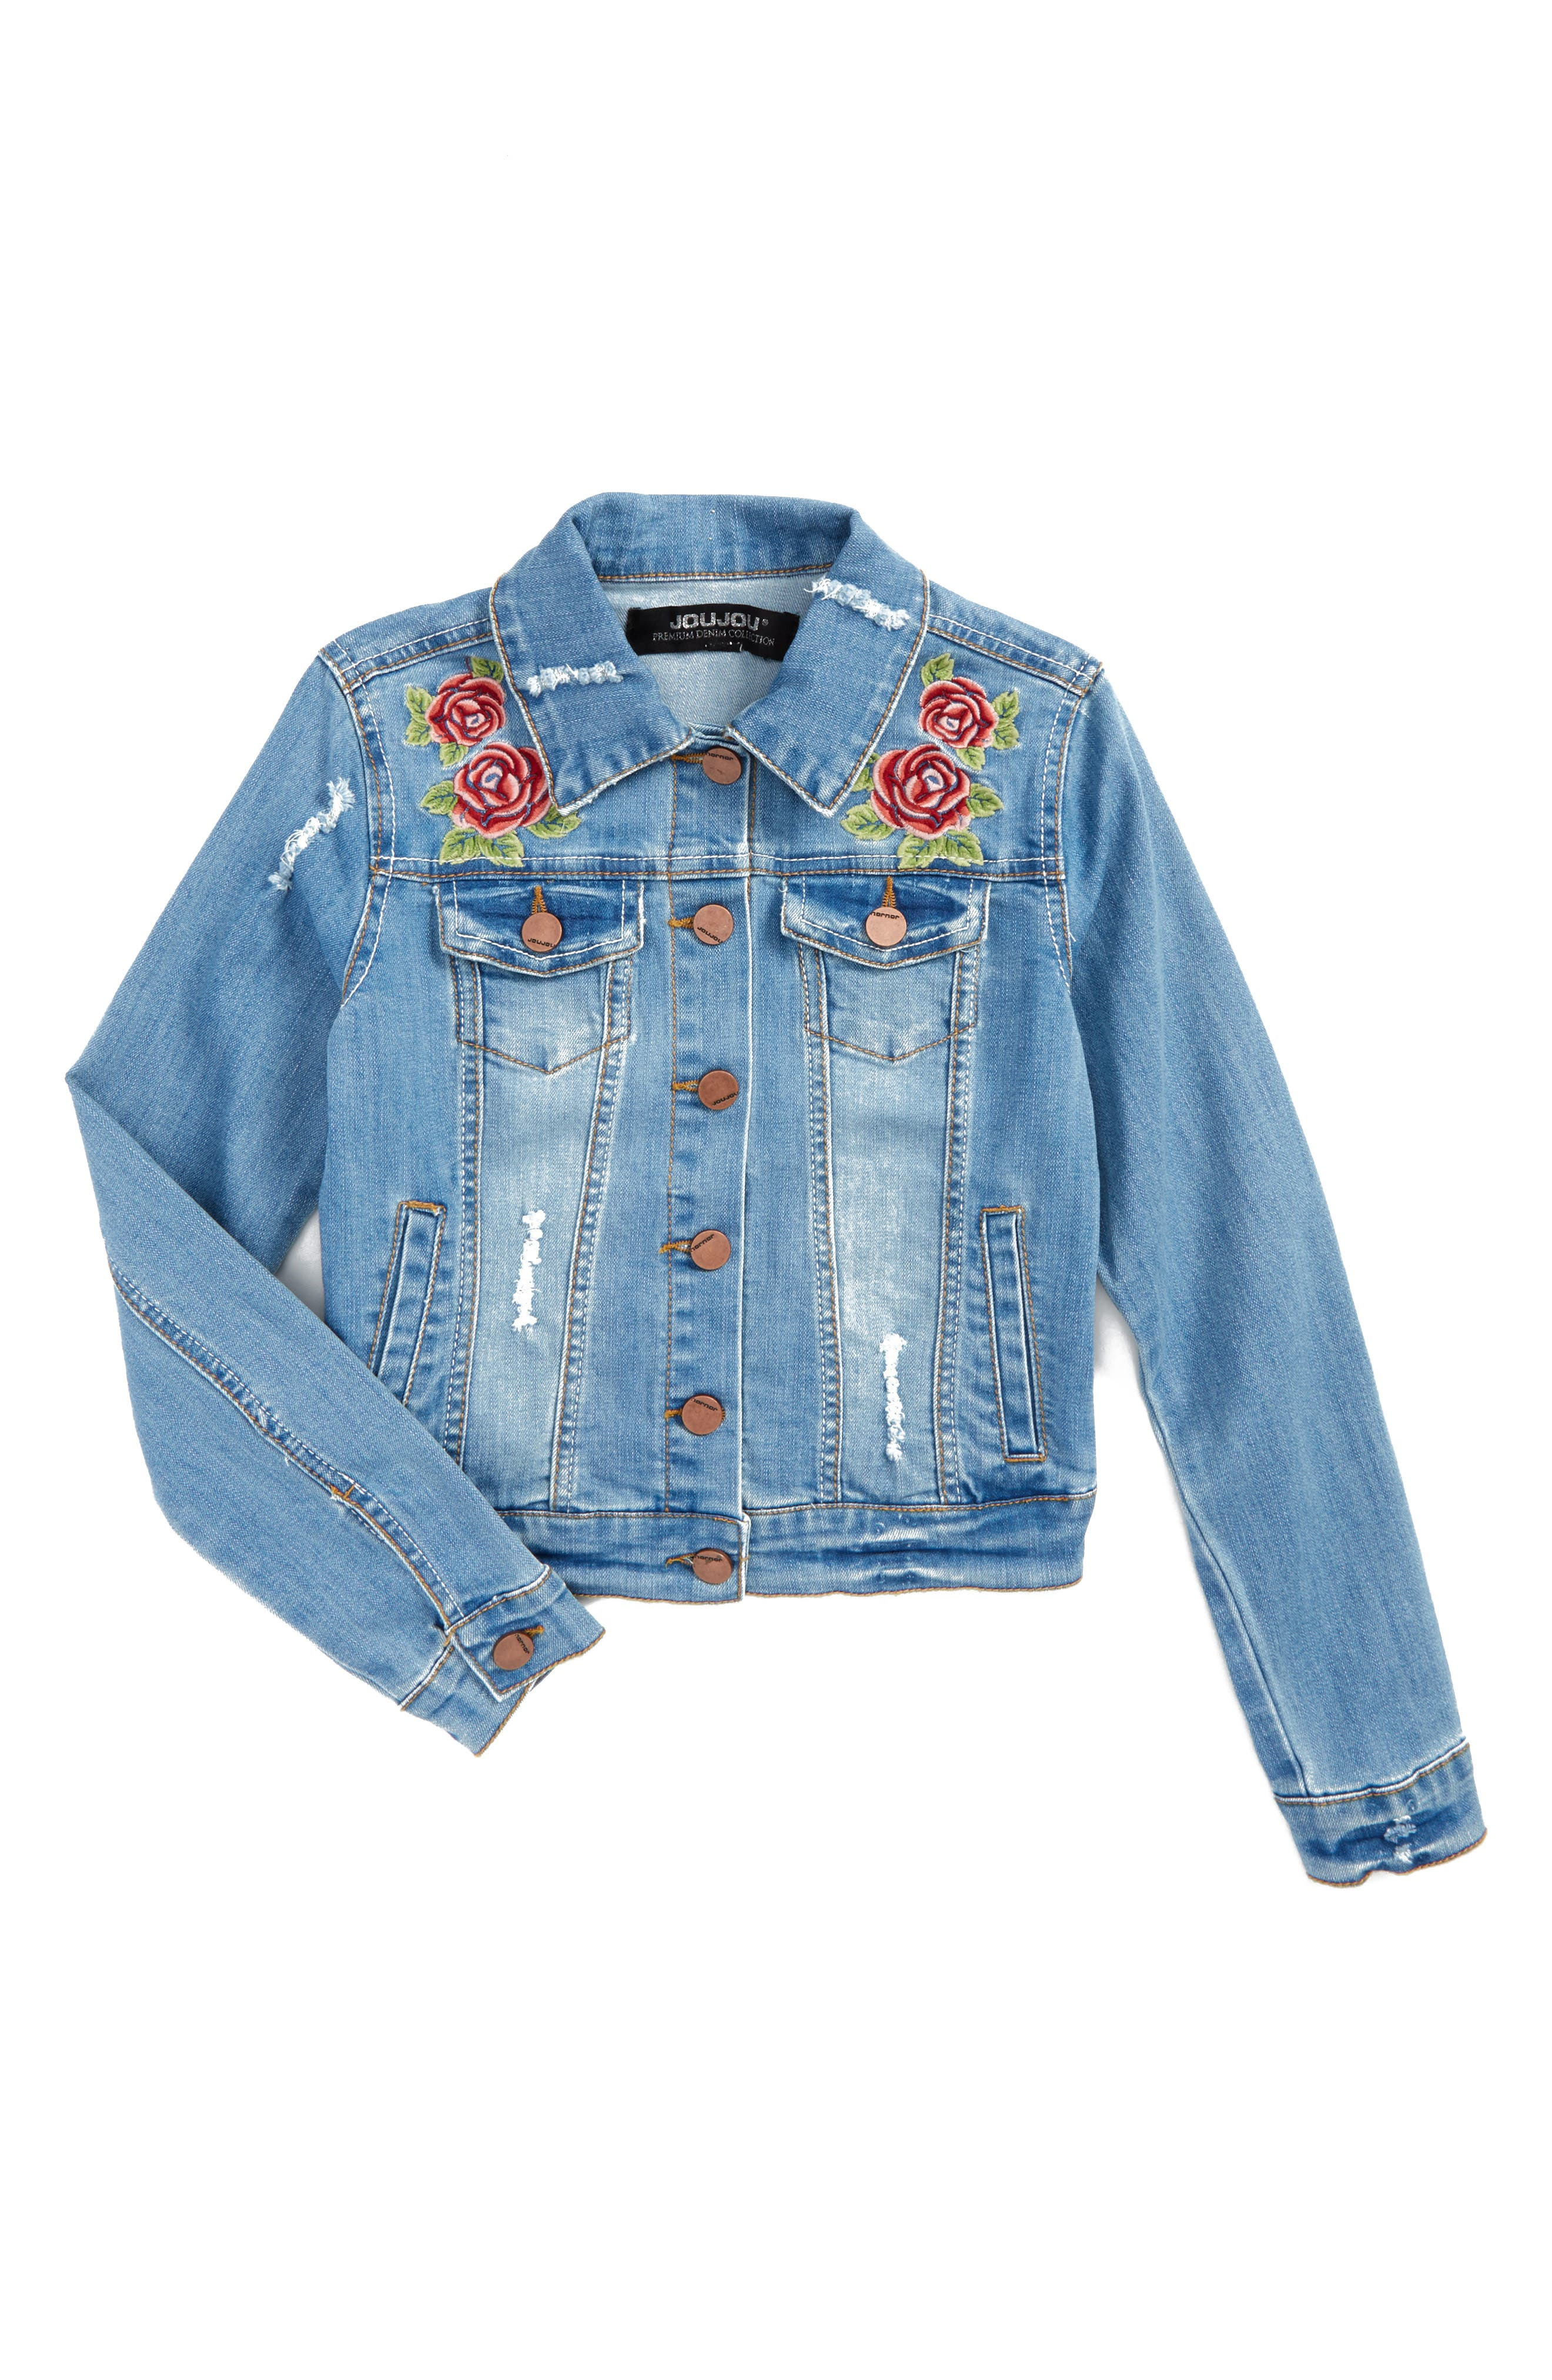 Embroidered Denim Jacket,                             Main thumbnail 1, color,